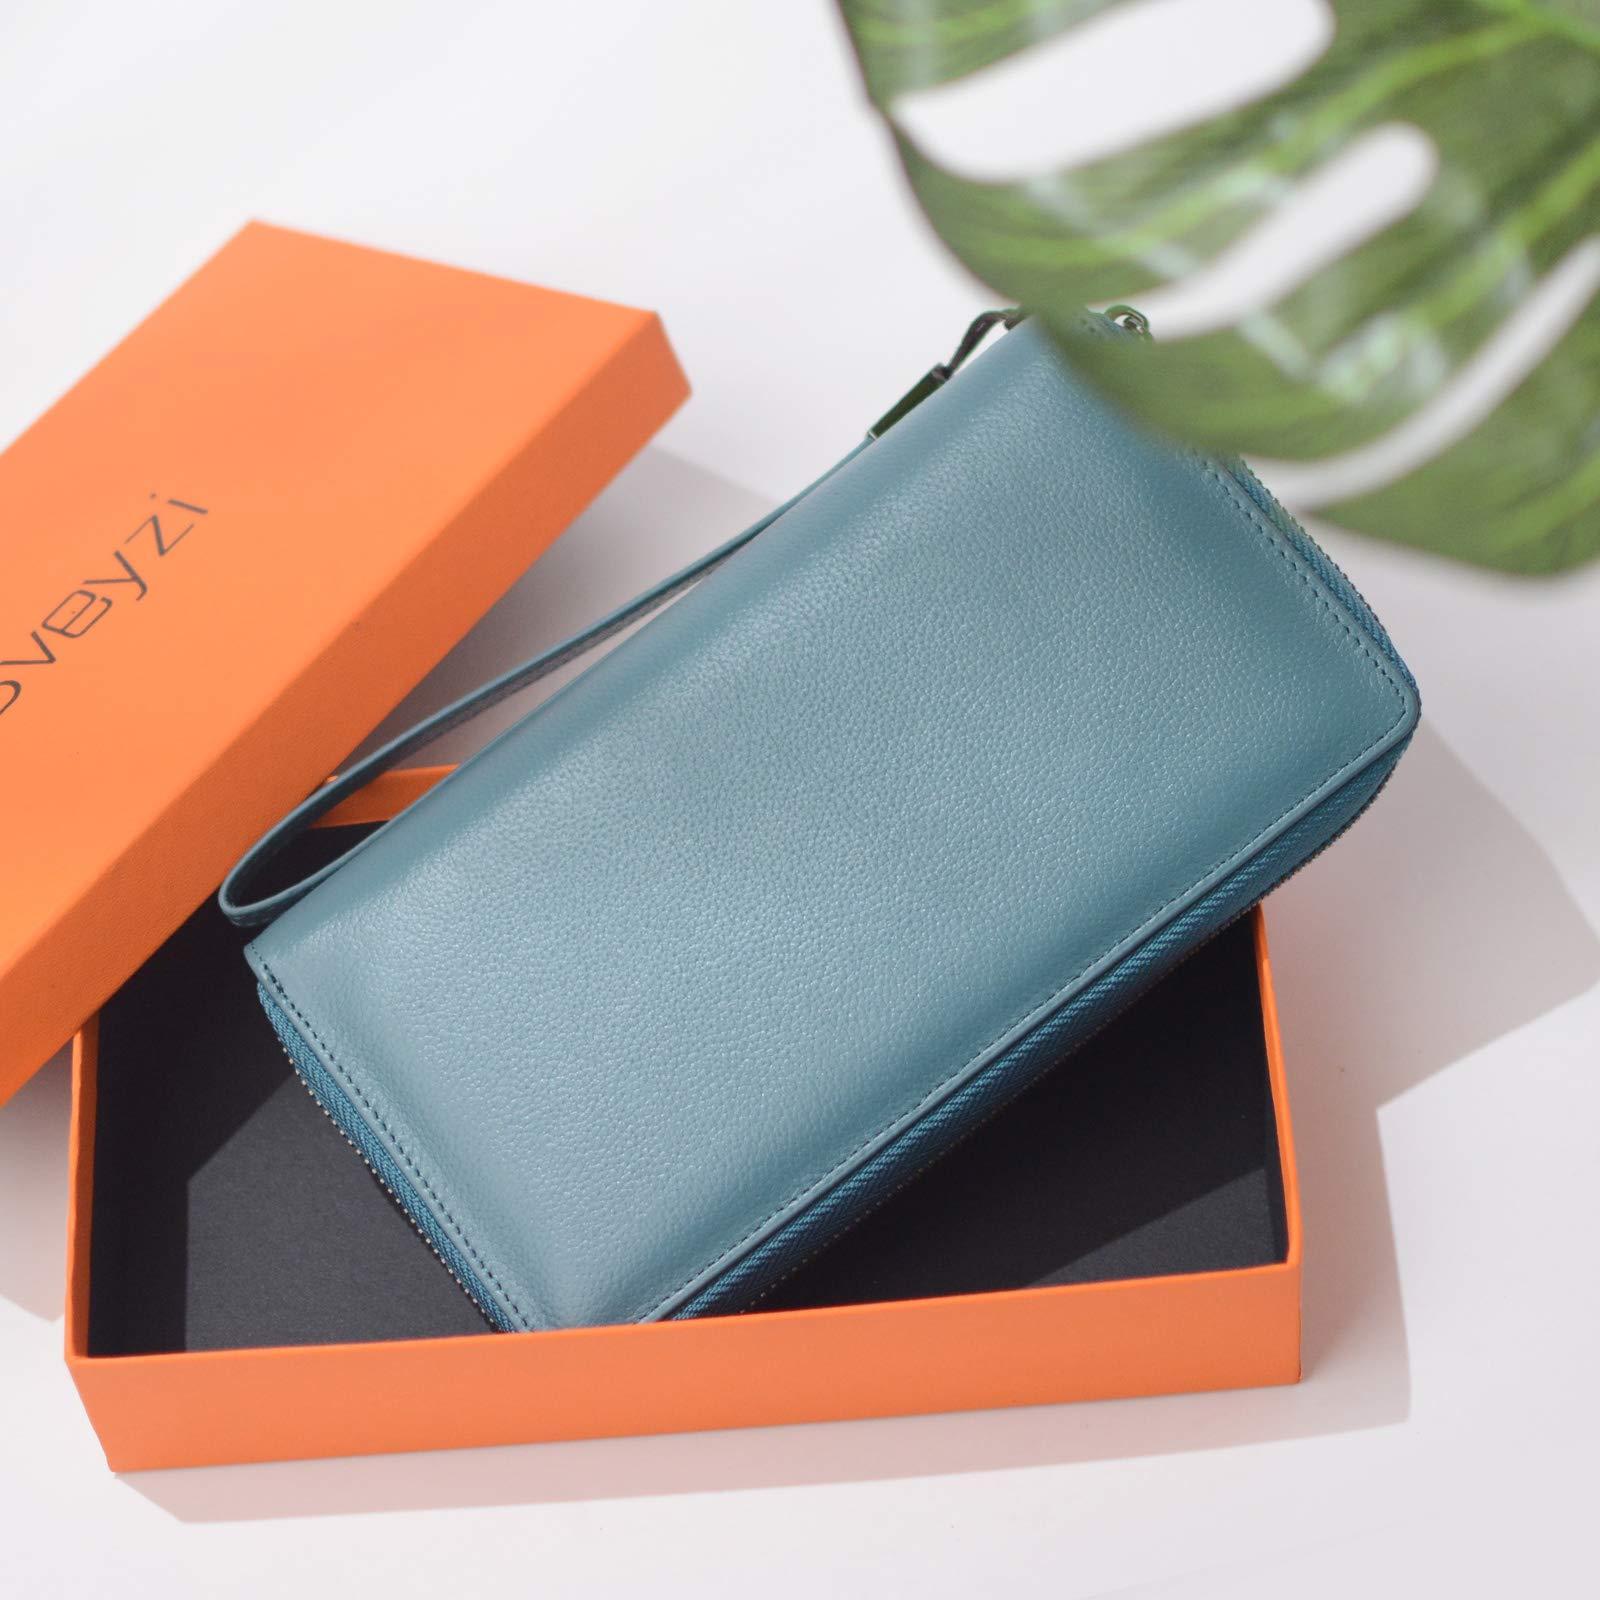 Women RFID Blocking Wallet Leather Zip Around Phone Clutch Large Travel Purse Wristlet (Lake Blue) by Bveyzi (Image #7)